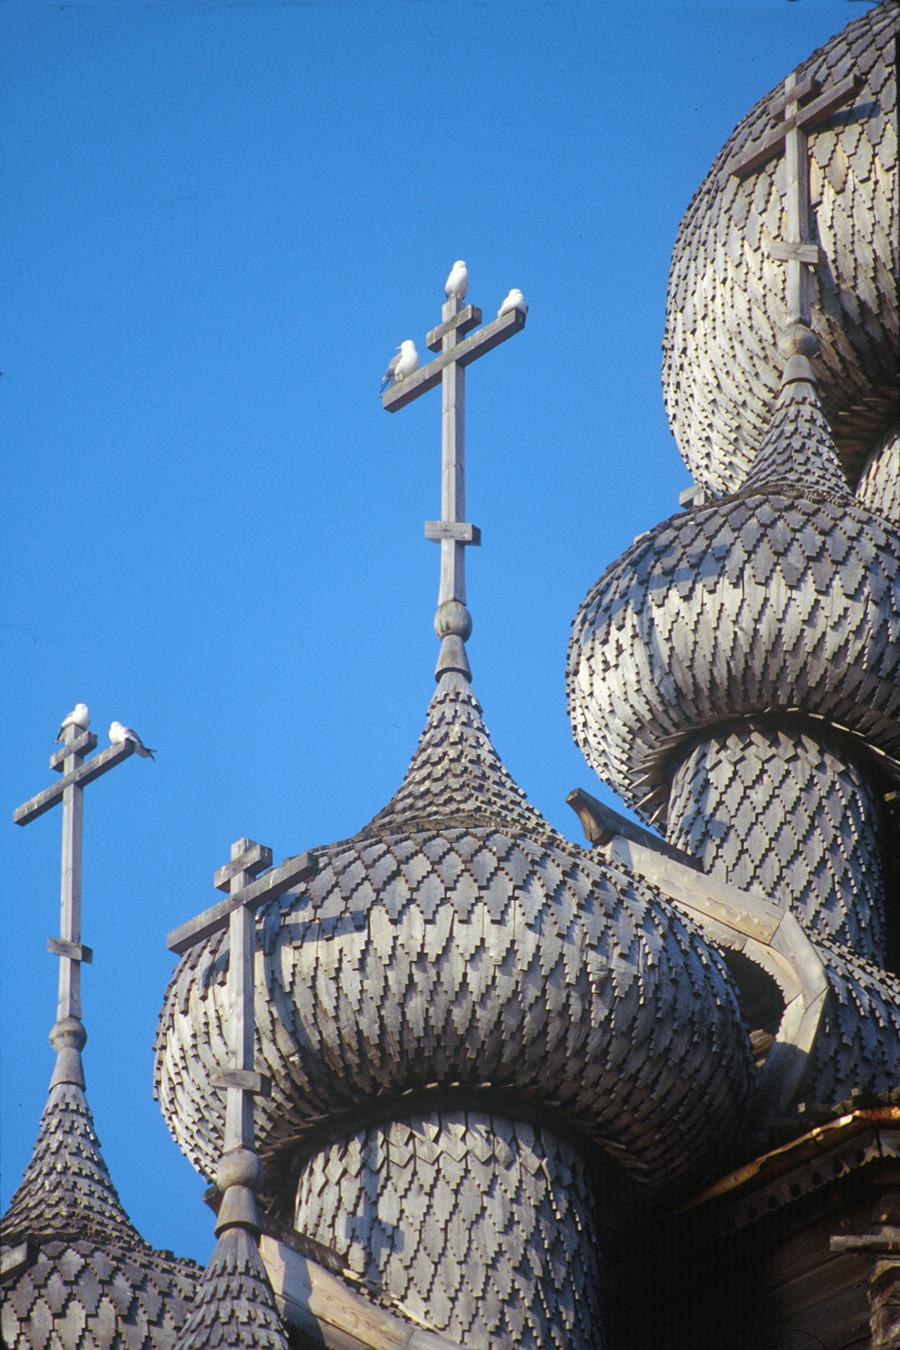 Iglesia de la Transfiguración. Fachada oeste, cúpulas con tejas de álamo. 6 de agosto de 1991